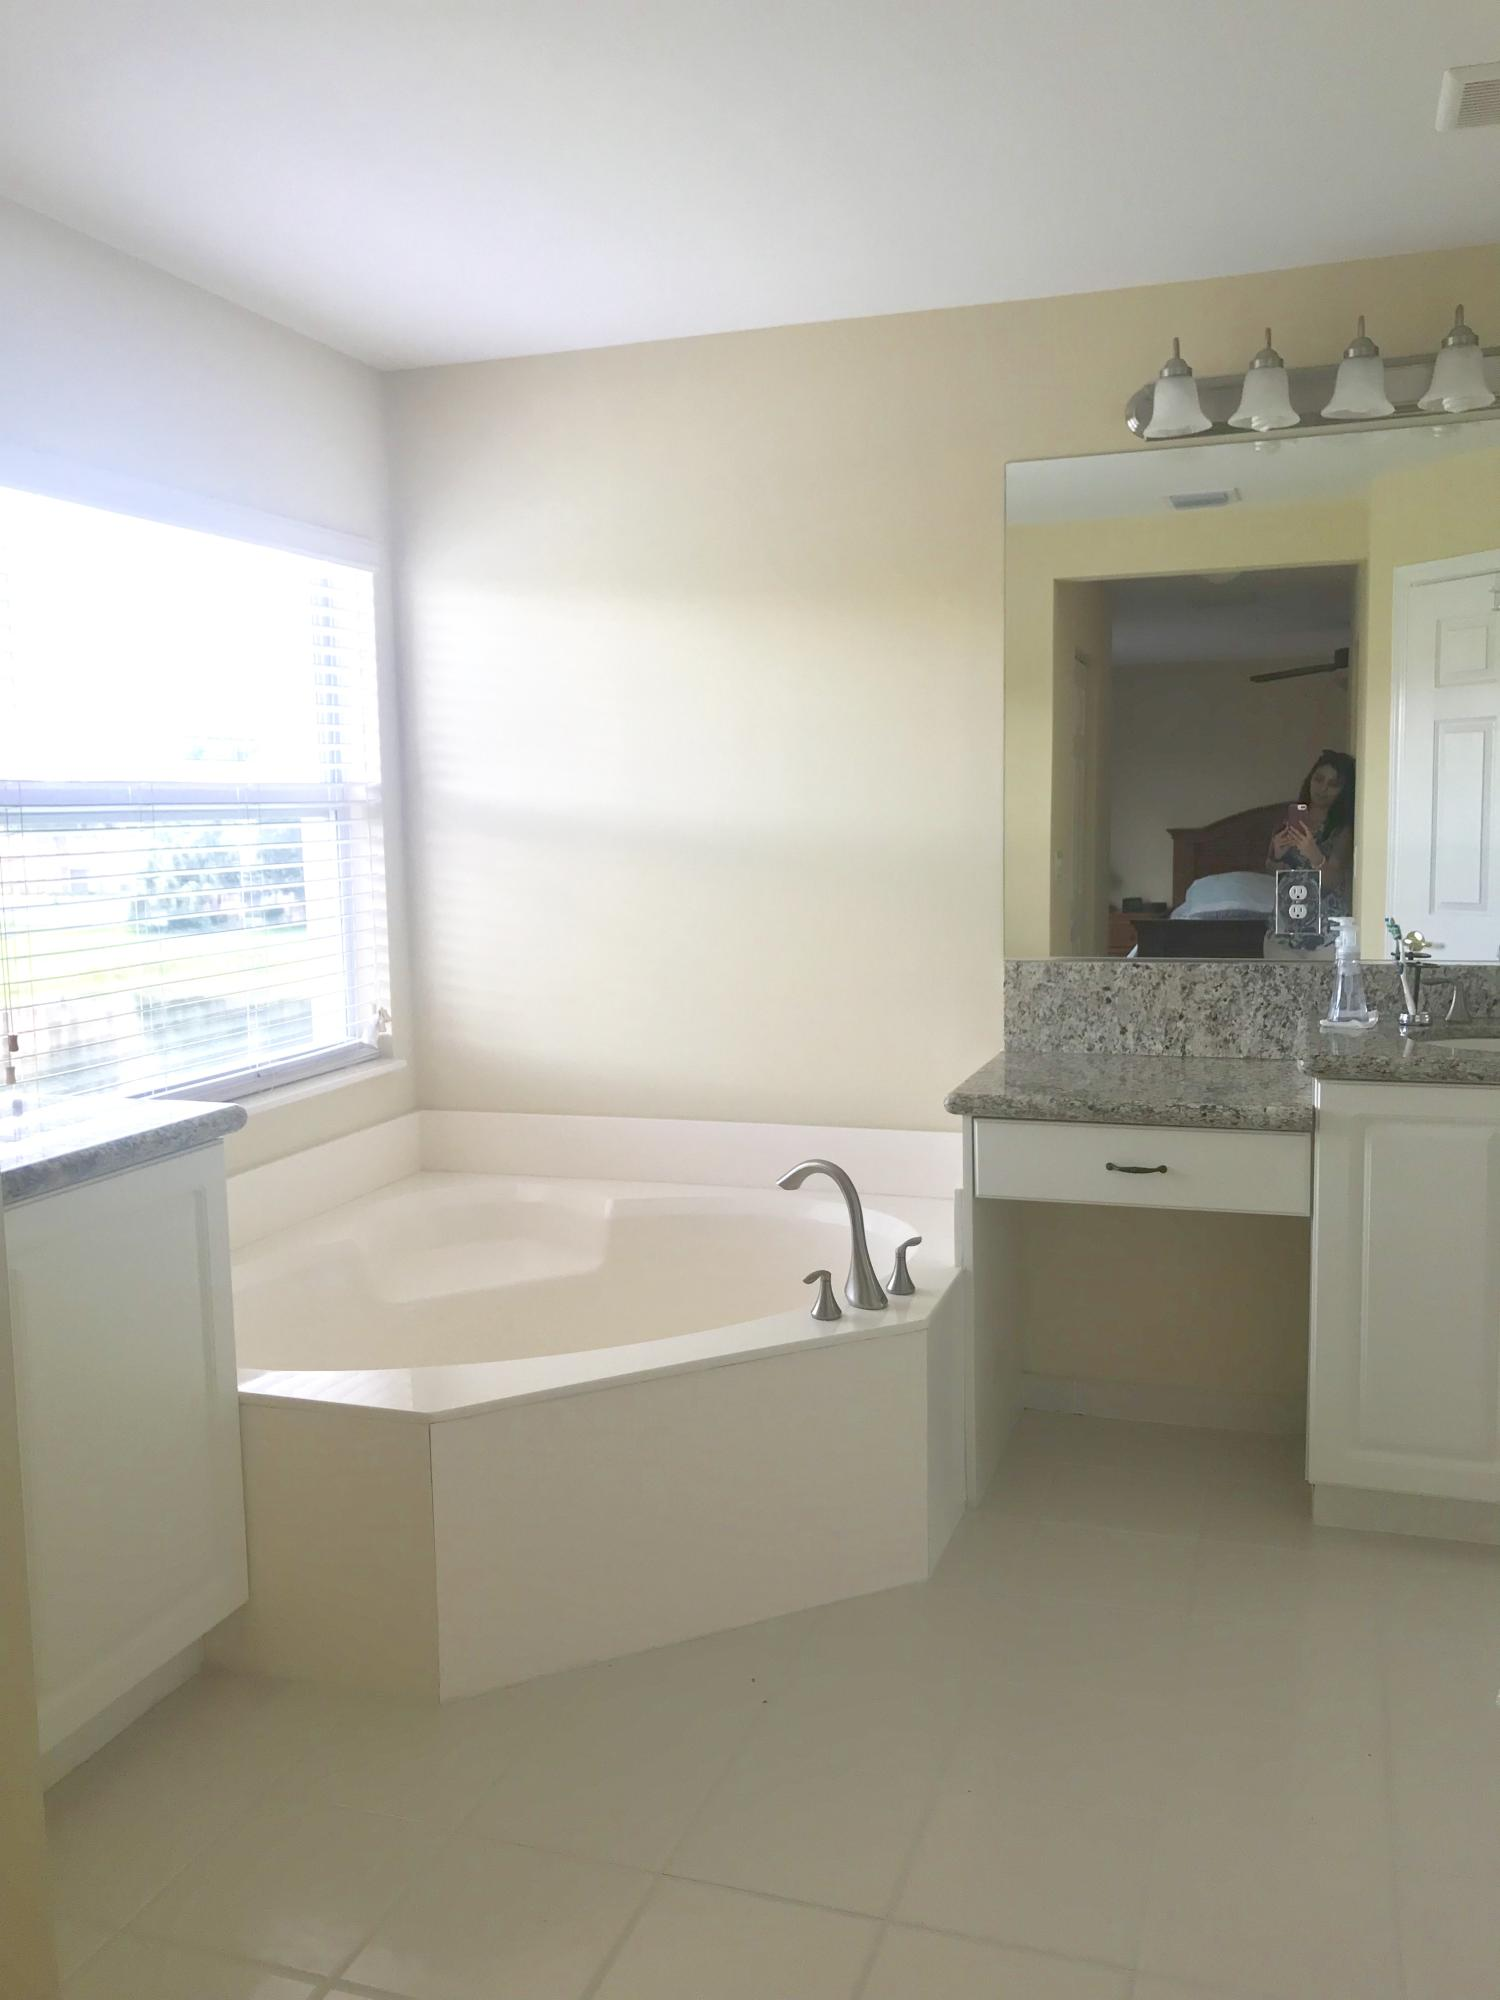 10167 White Water Lily Way Boynton Beach, FL 33437 photo 28